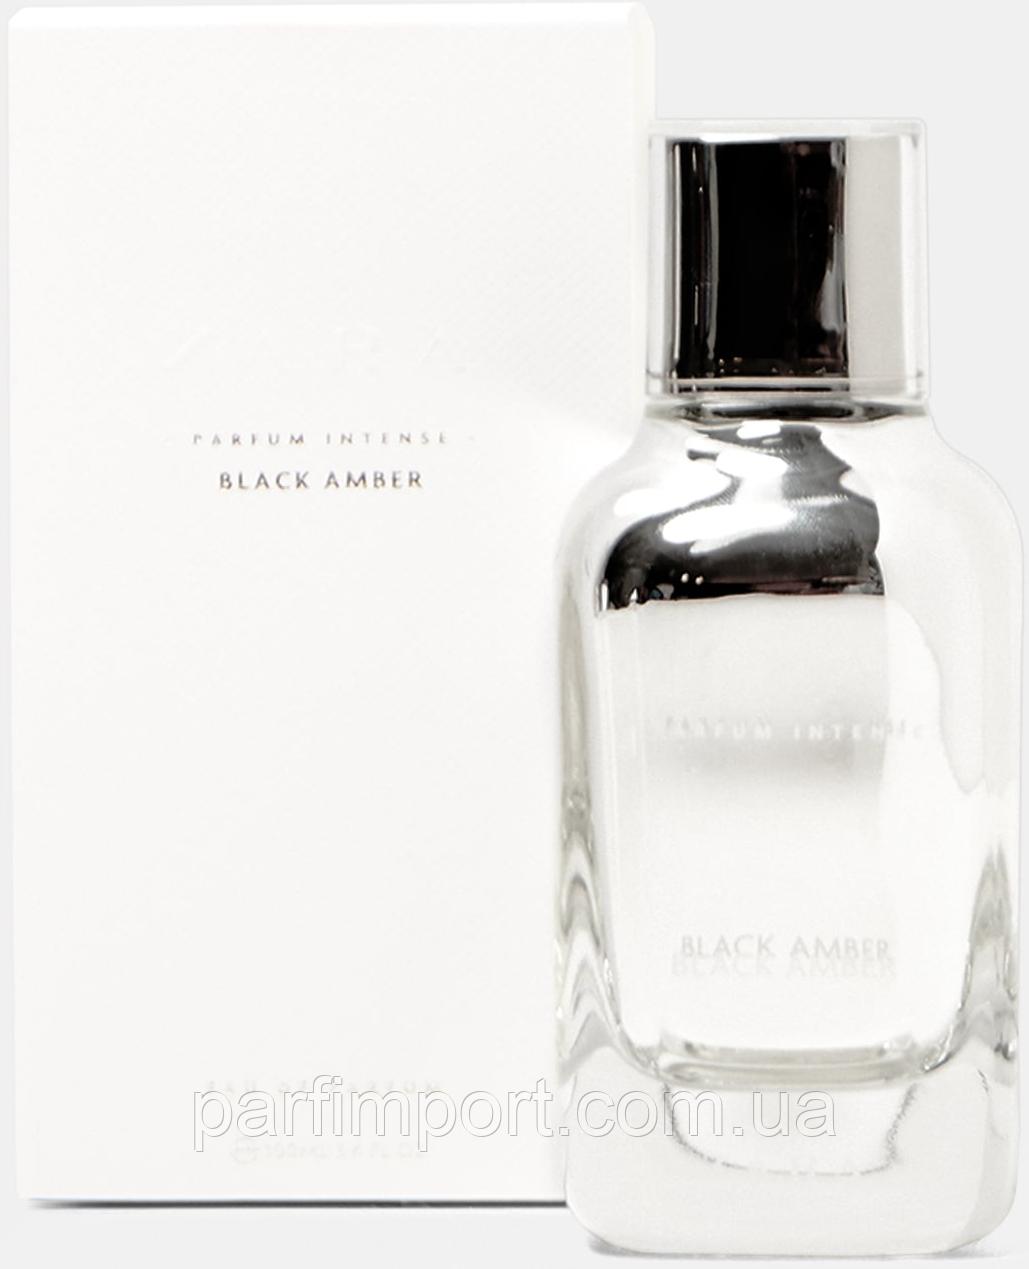 Zara Black Amber Parfum Intense EDP 100 ml (оригинал подлинник Испания)